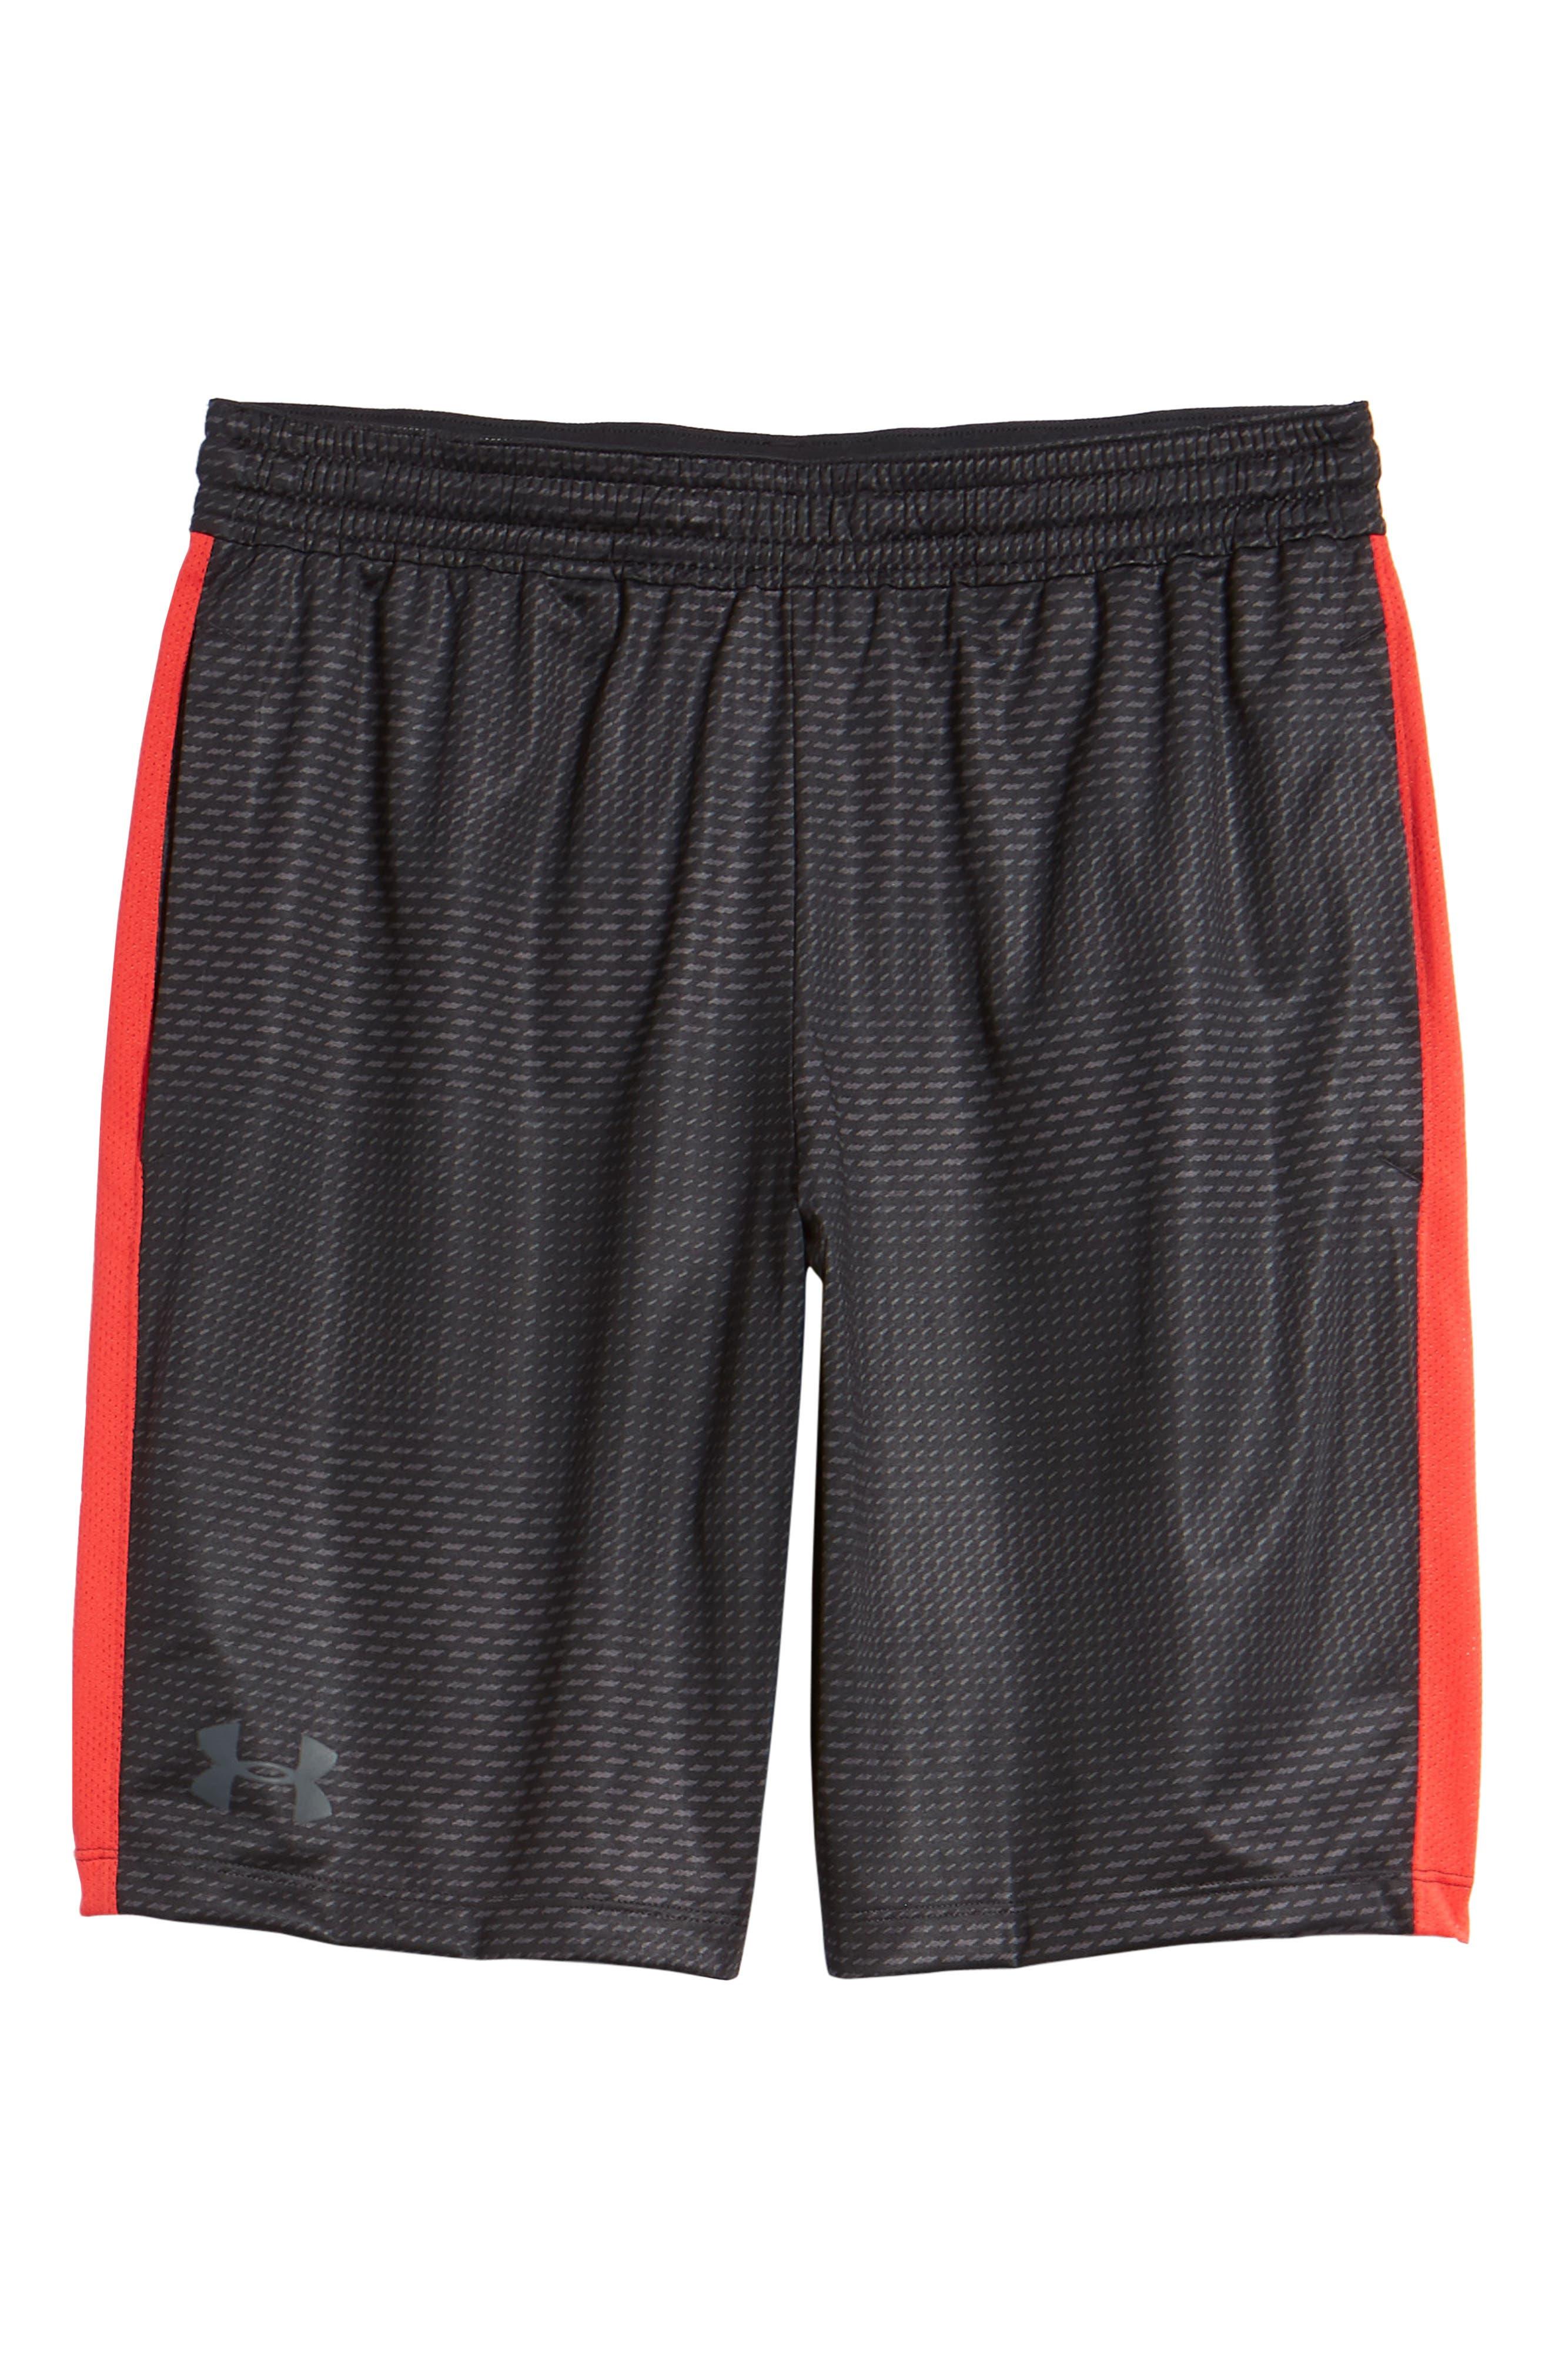 UNDER ARMOUR,                             Raid 2.0 Classic Fit Shorts,                             Alternate thumbnail 6, color,                             001